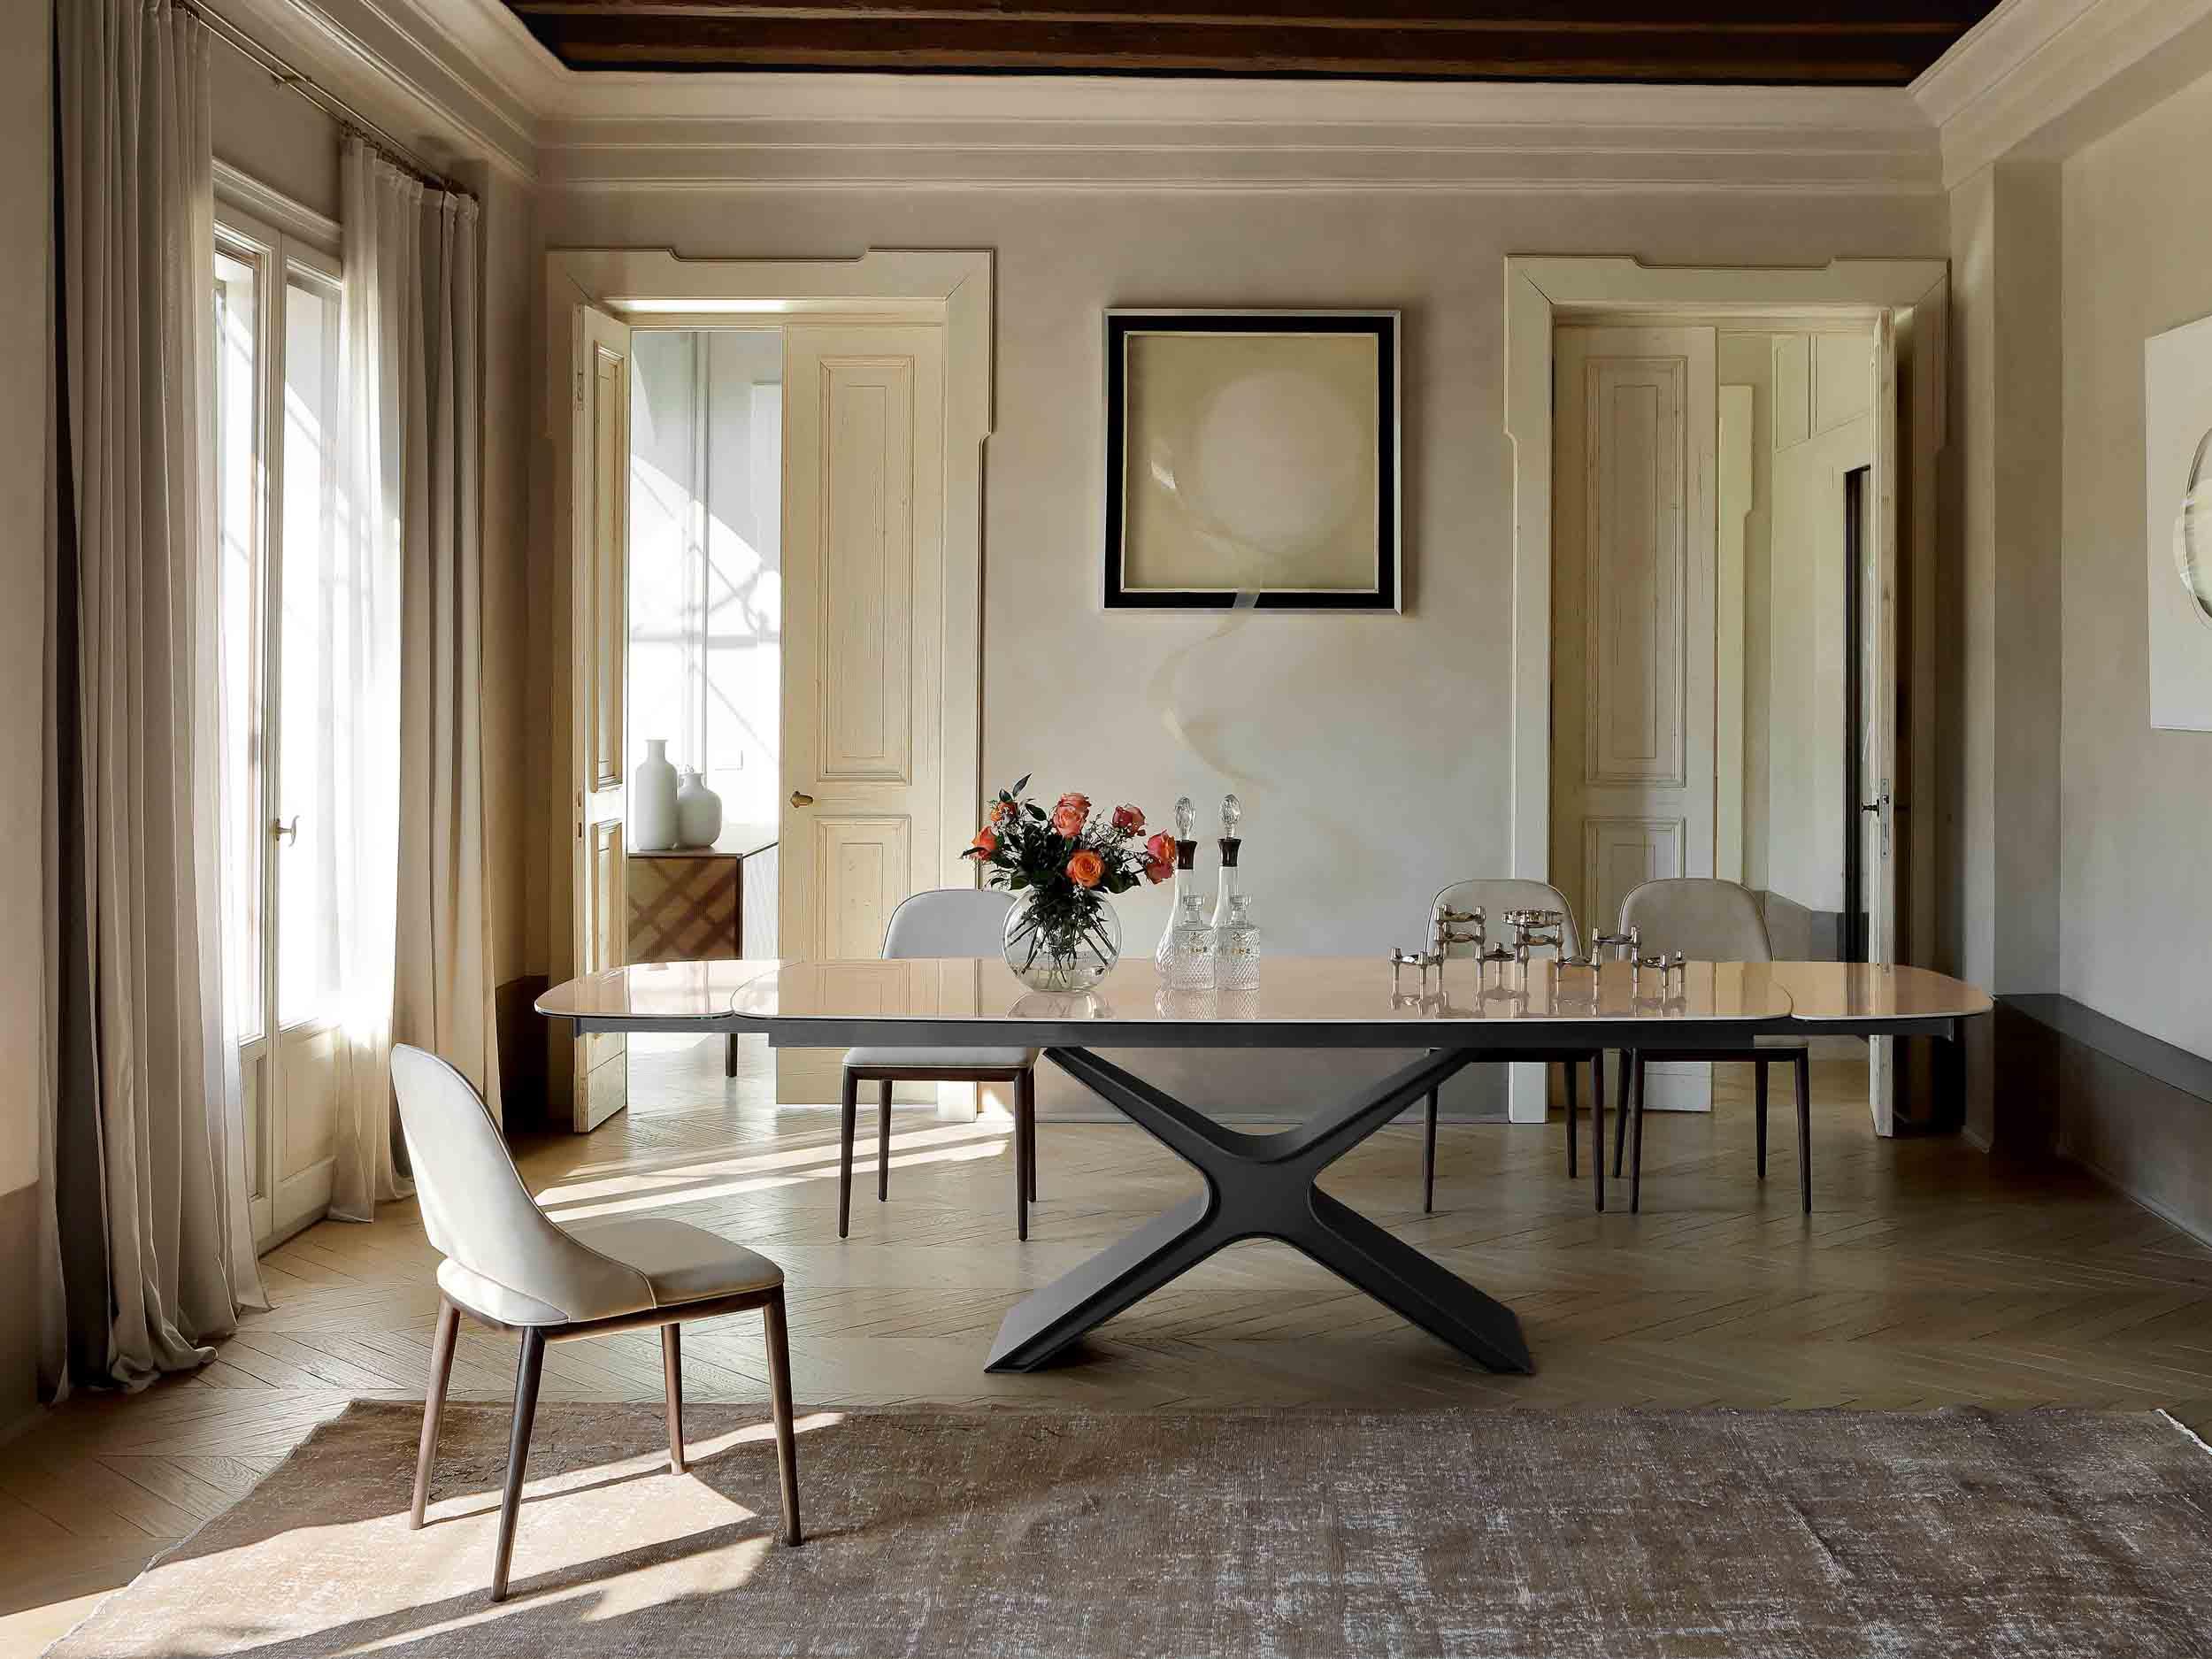 Calliope Table + Malva Chair